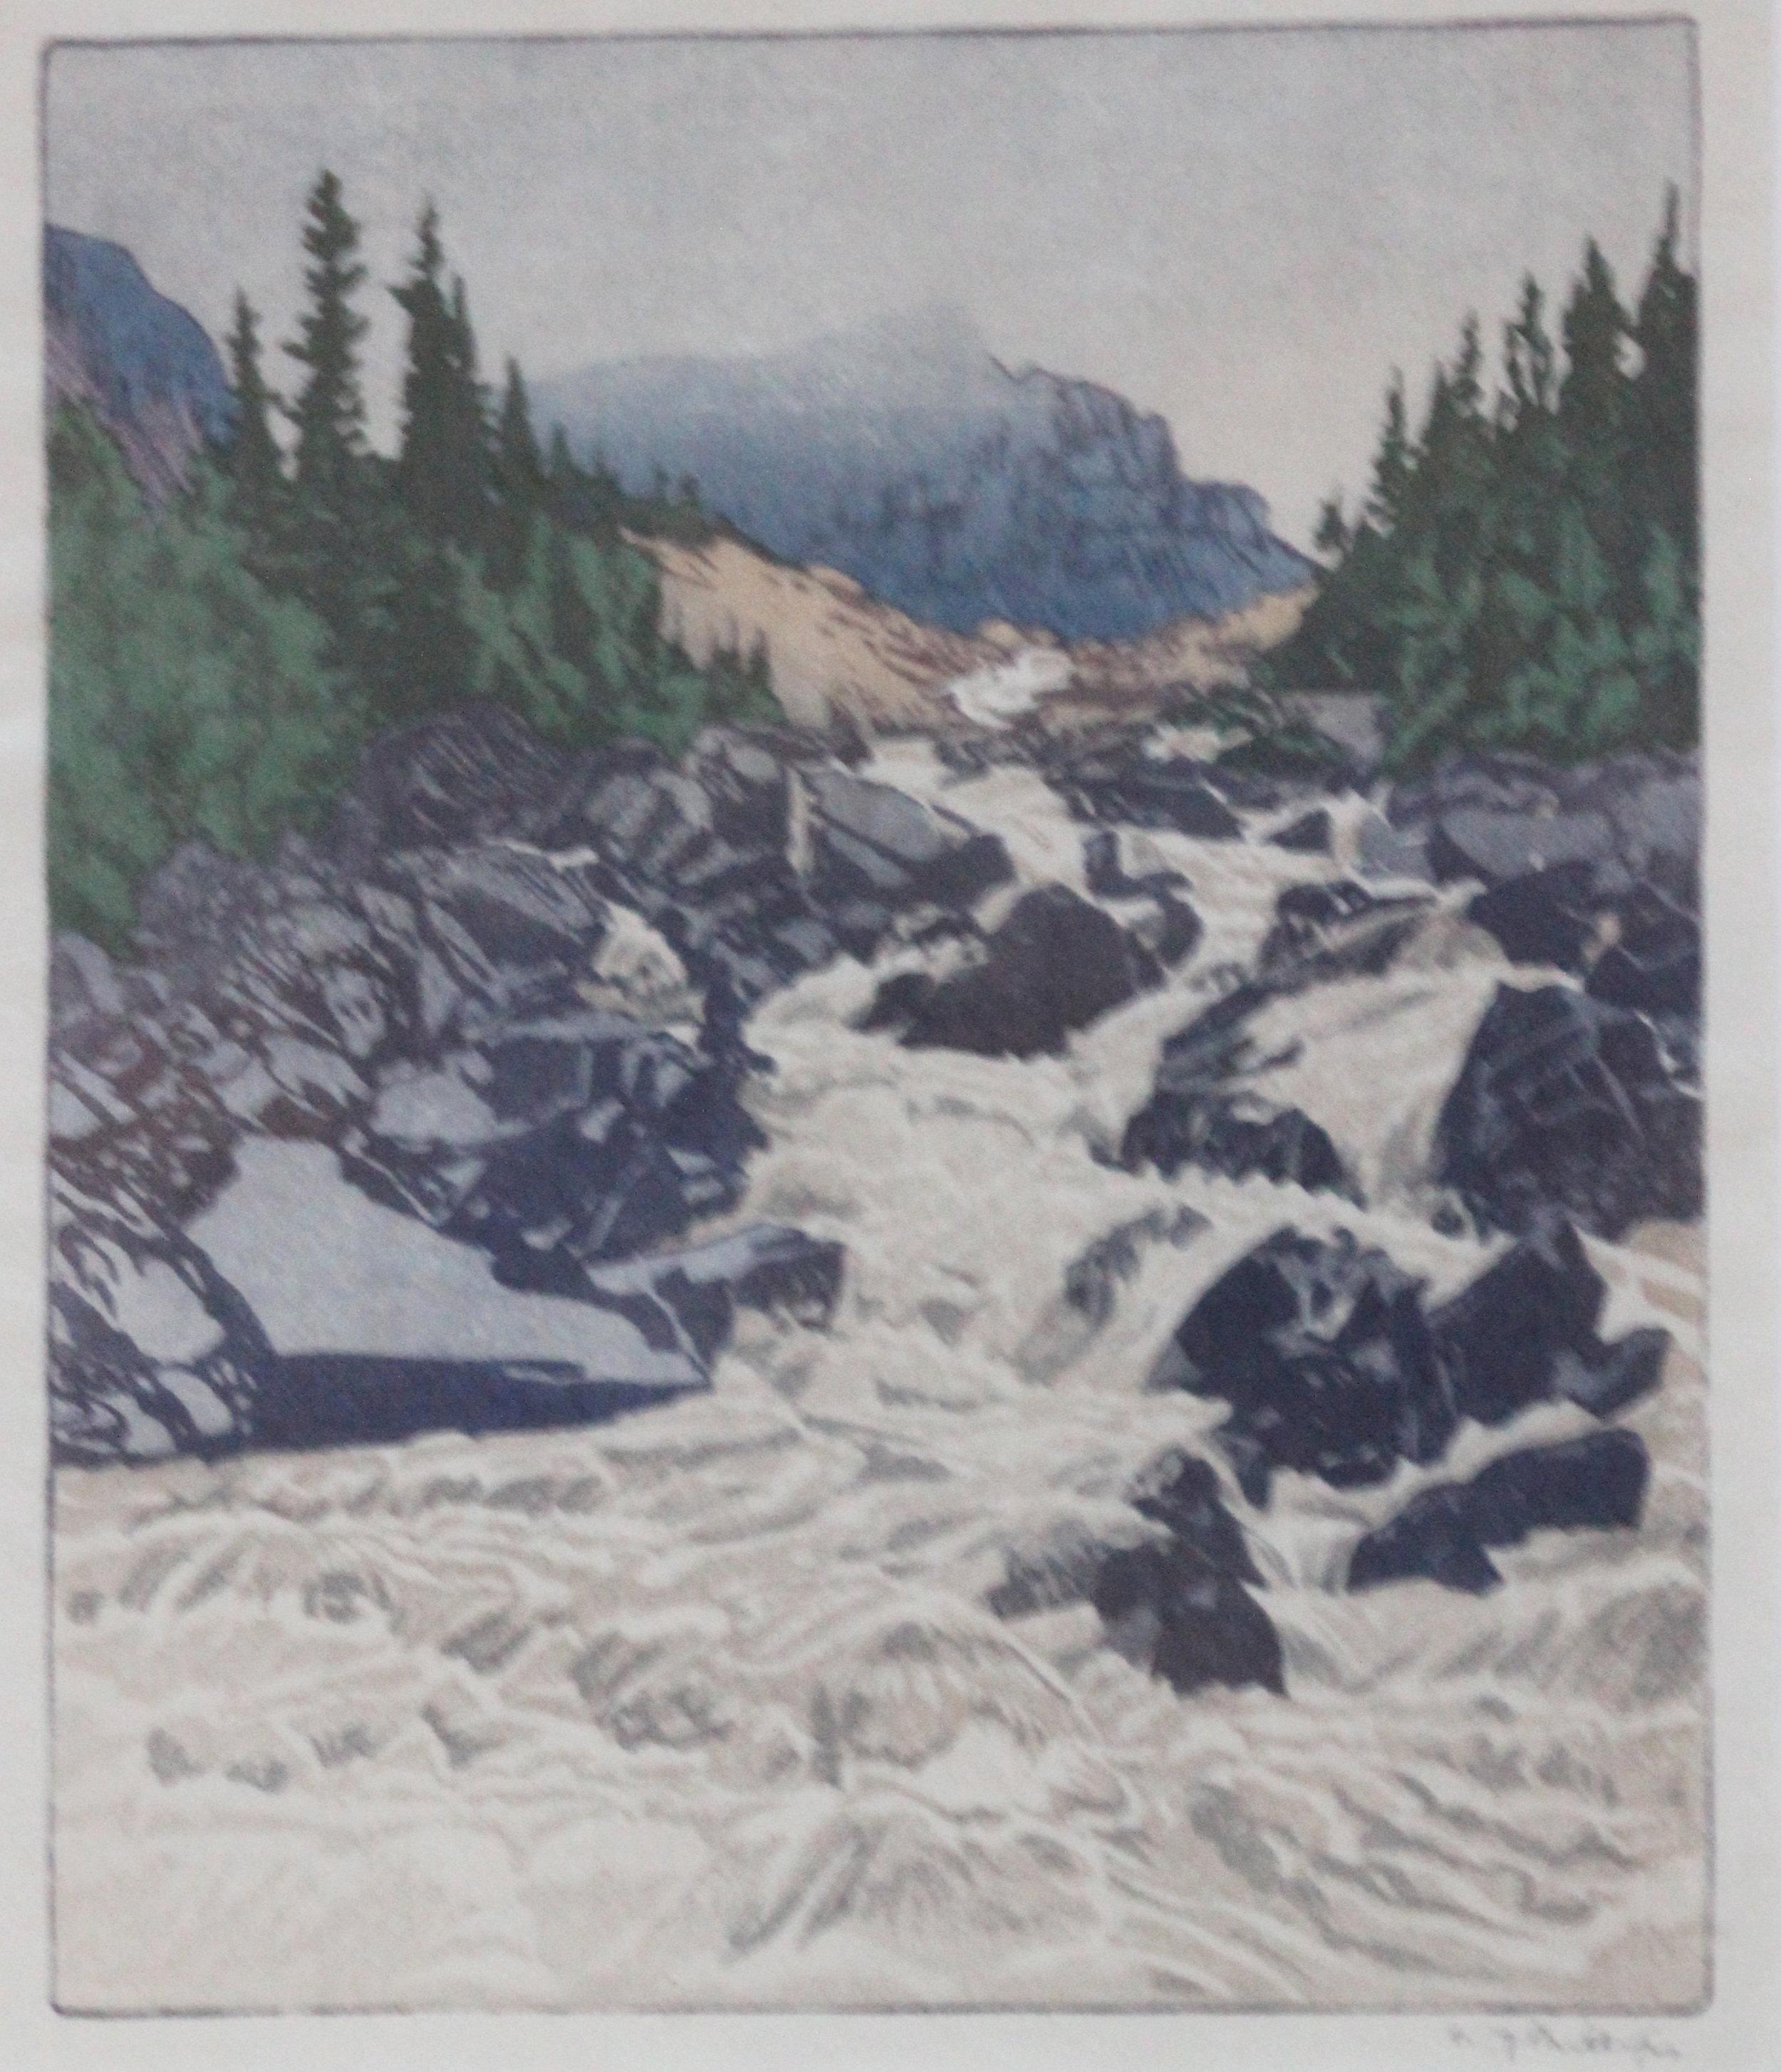 Walter J. Phillips, Above lake Louise, 1945